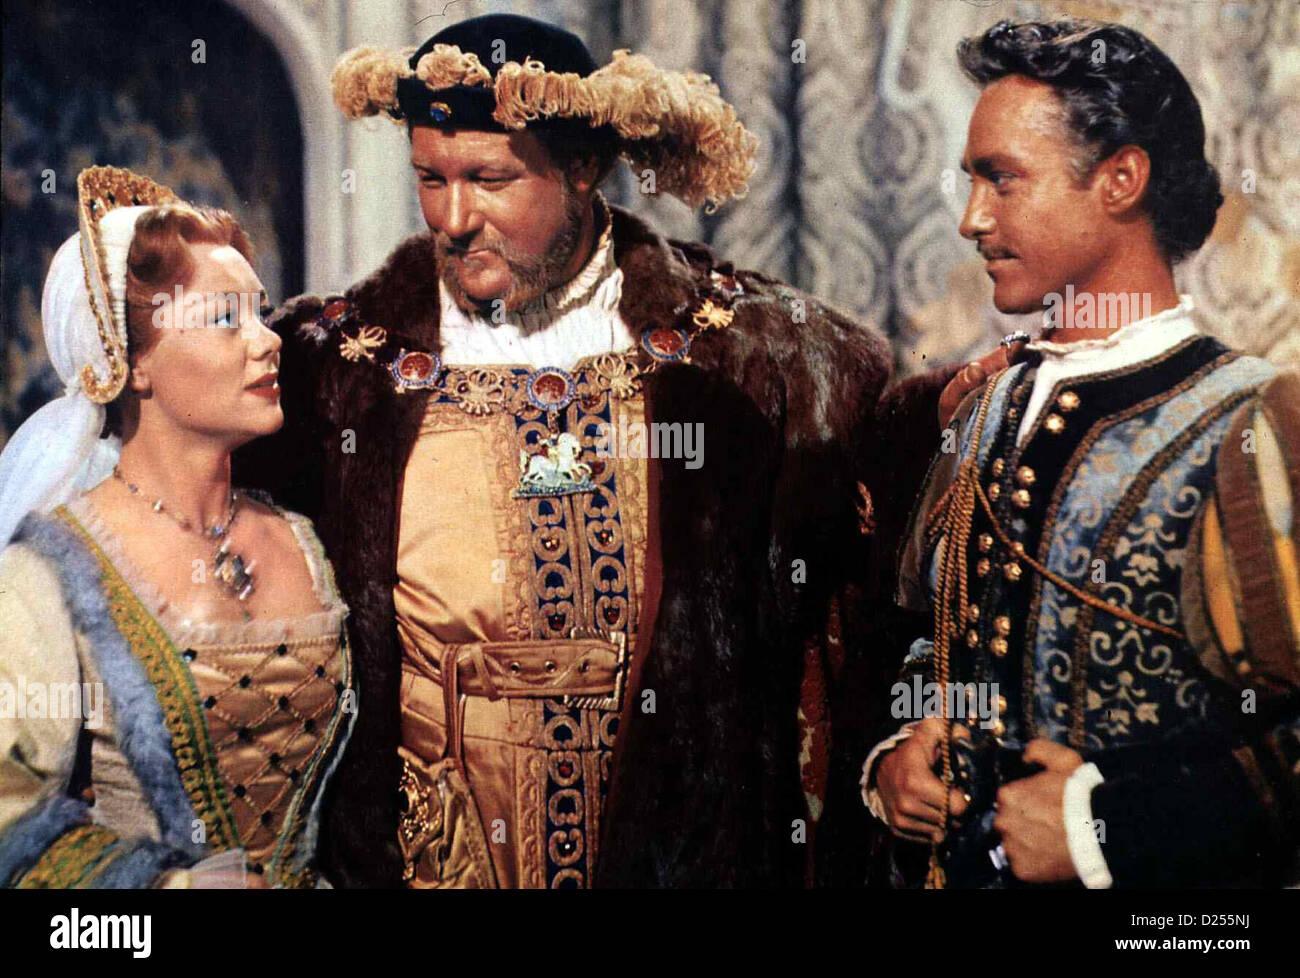 Eine Prinzessin Verliebt Sich  Sword Rose,  Glynis Johns, James Robertson Justice, Richard Todd Prinzessin Mary - Stock Image